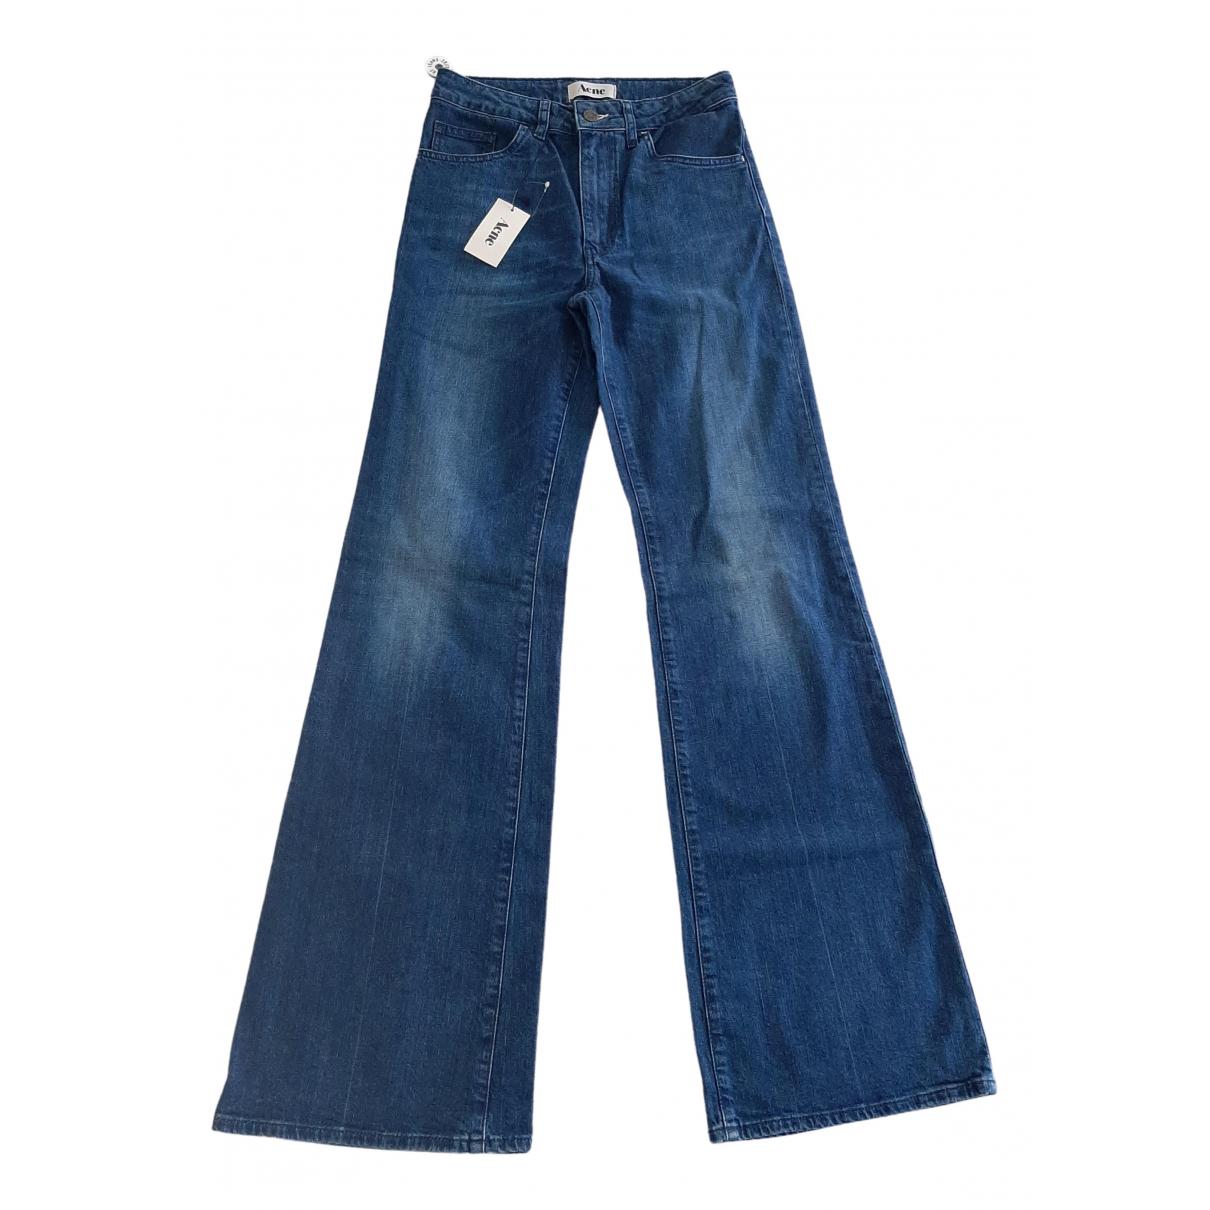 Acne Studios \N Blue Cotton - elasthane Jeans for Women 29 US